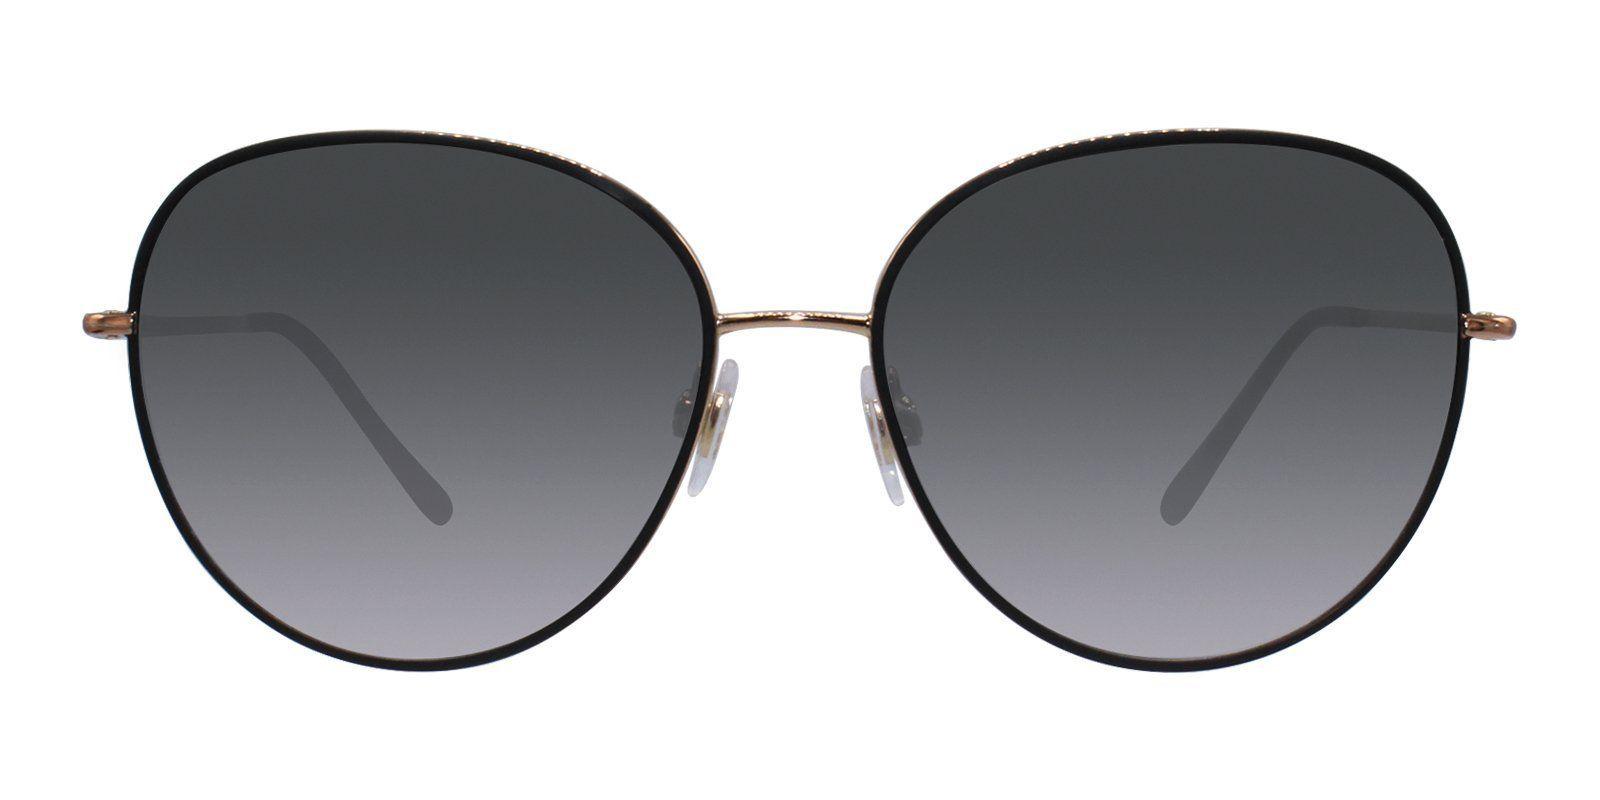 851305ae9f Dolce Gabbana - DG2194 Bronze - Gray sunglasses